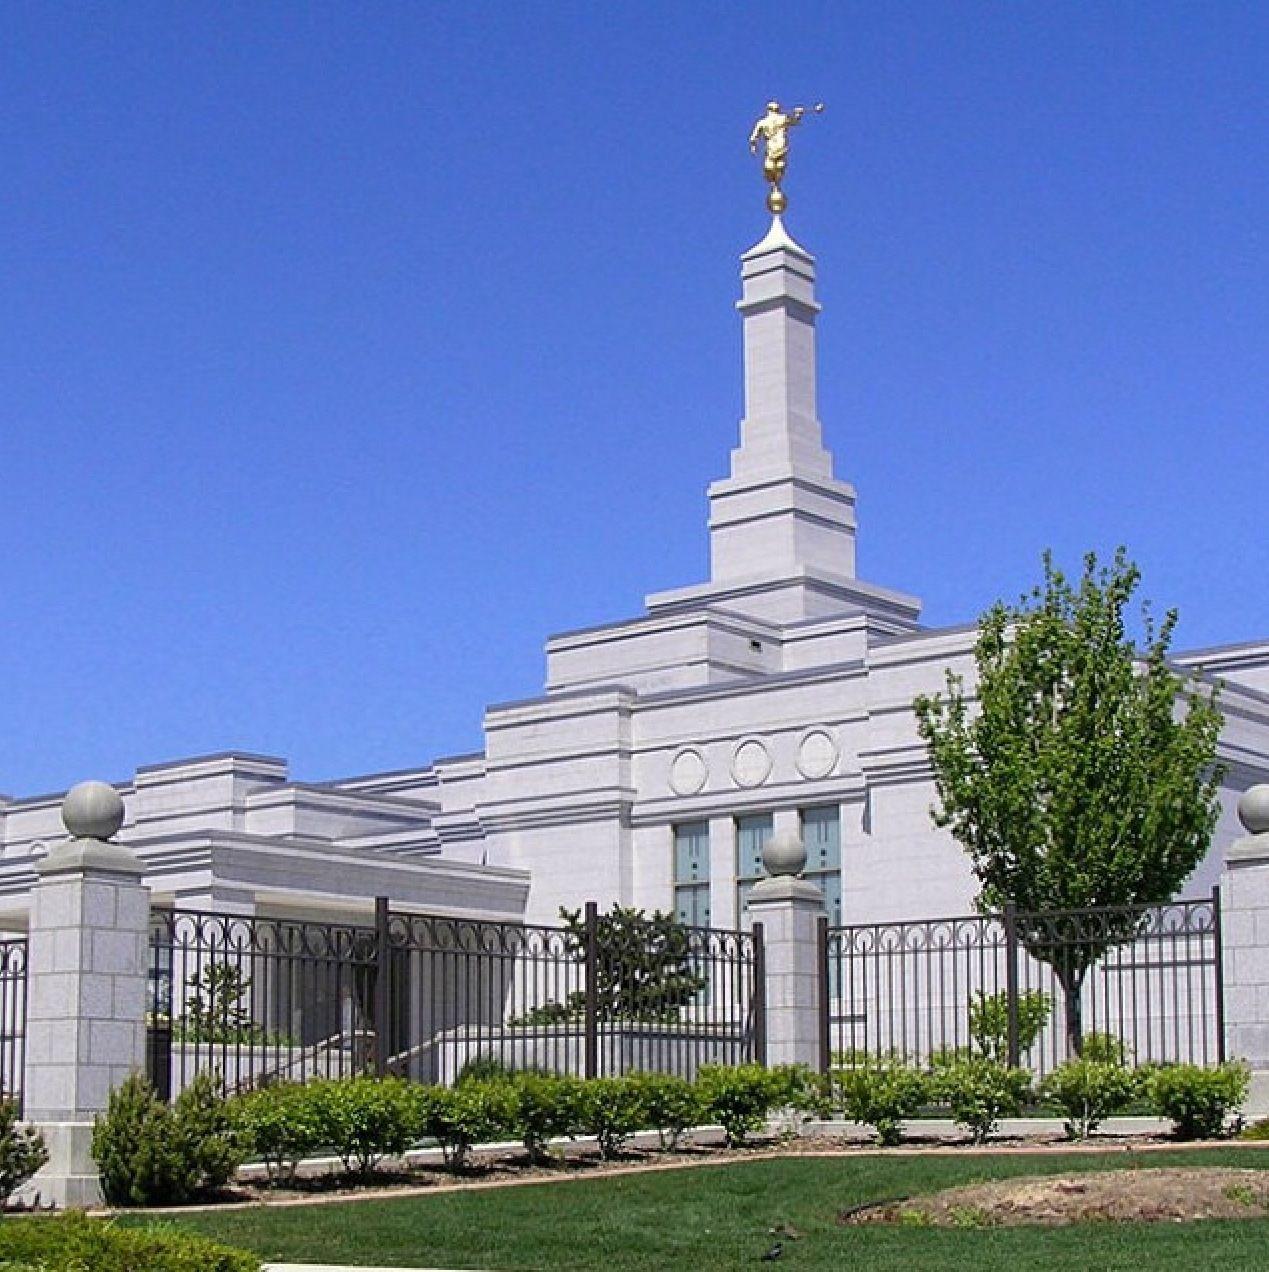 Pin on Mormon things